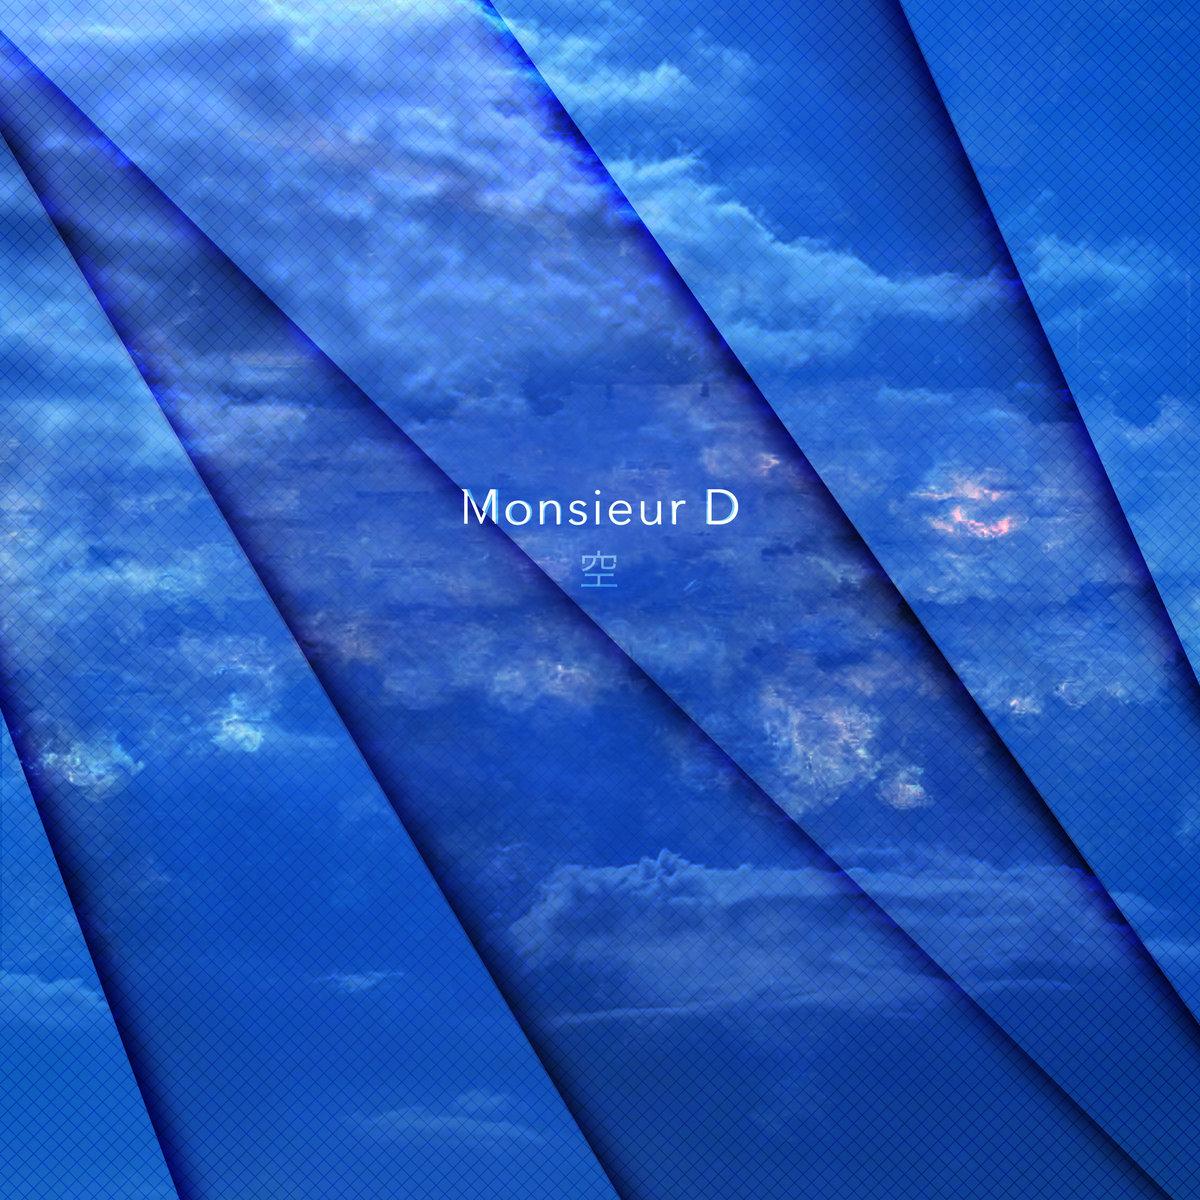 空 by Monsieur D